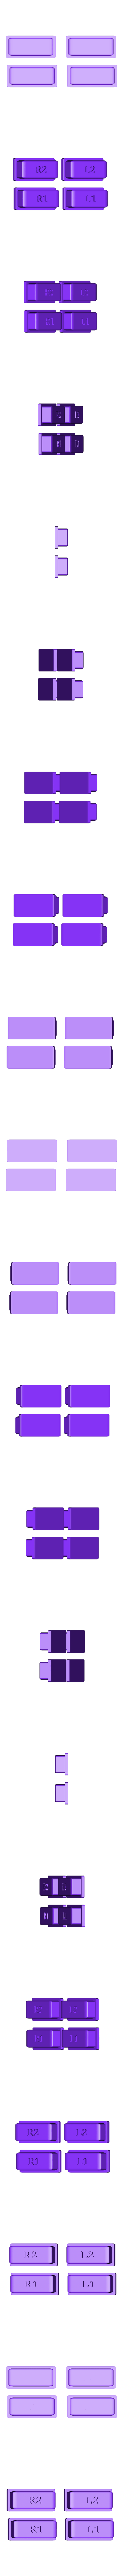 Botões.stl Download free STL file Projeto ANARC portable console with Raspberry PI • 3D printer template, CircuitoMaker